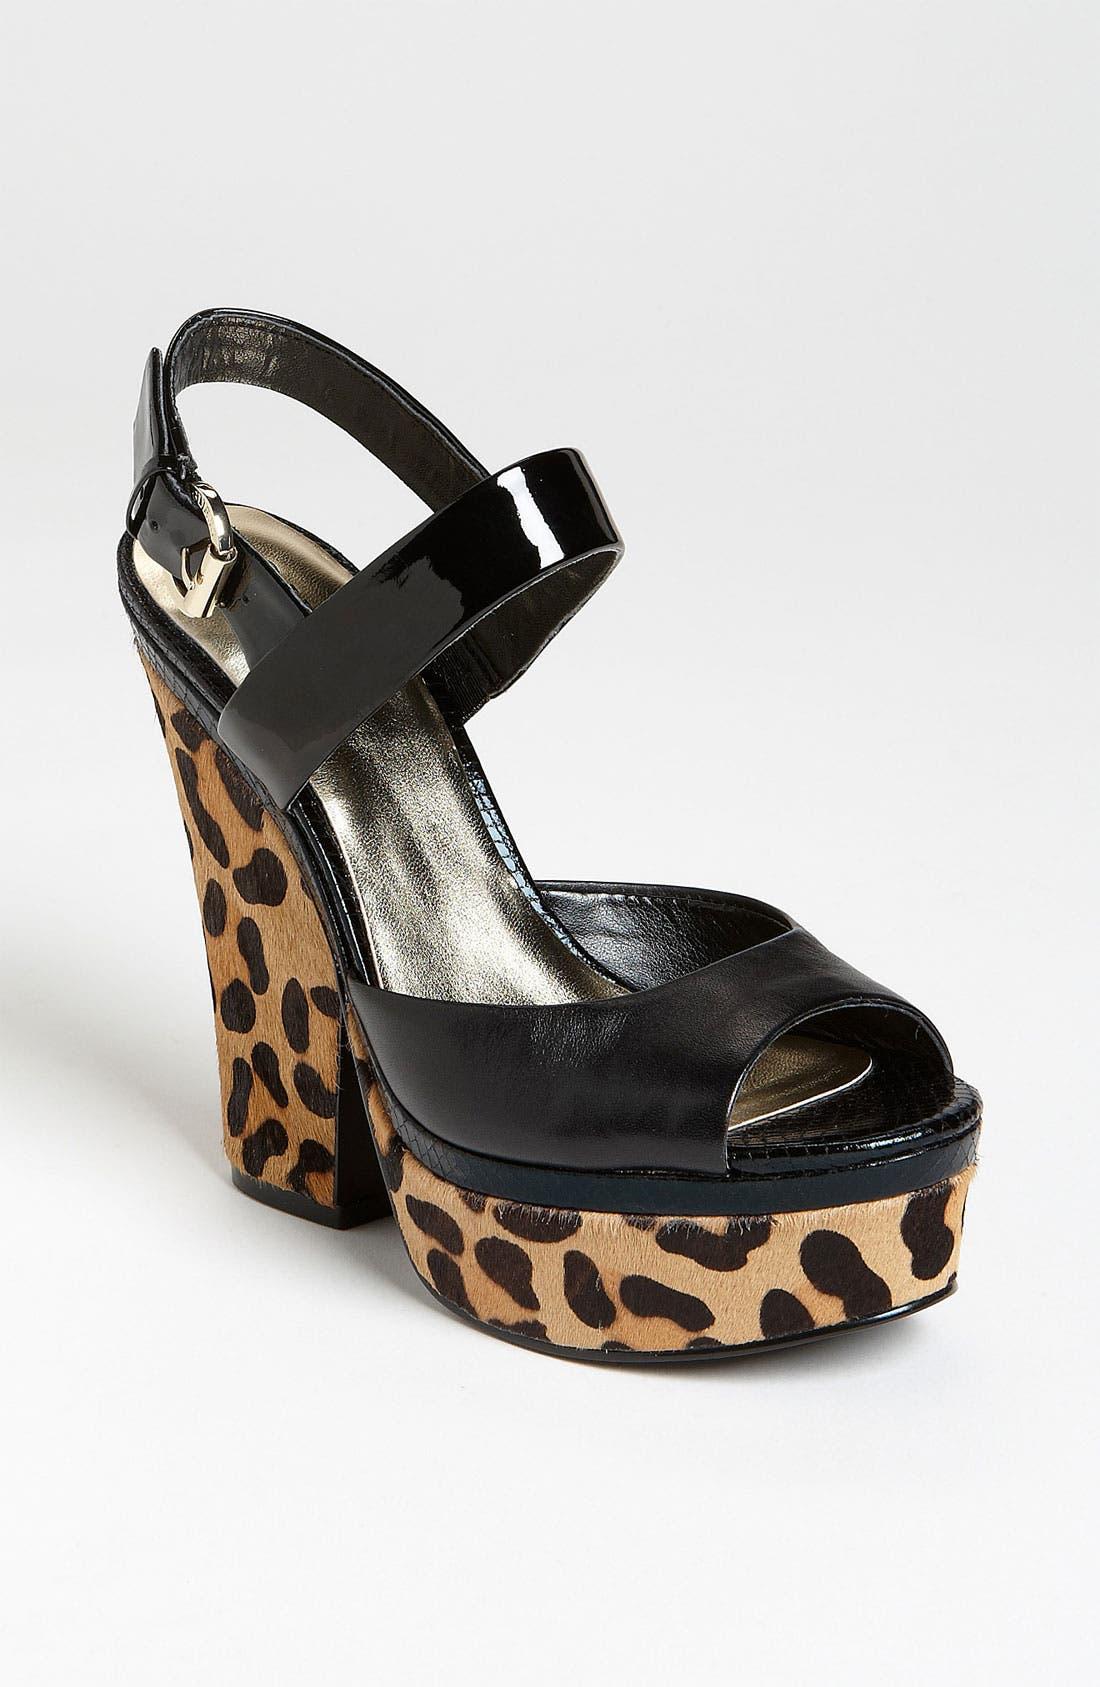 Main Image - GUESS 'Jadynn' Sandal